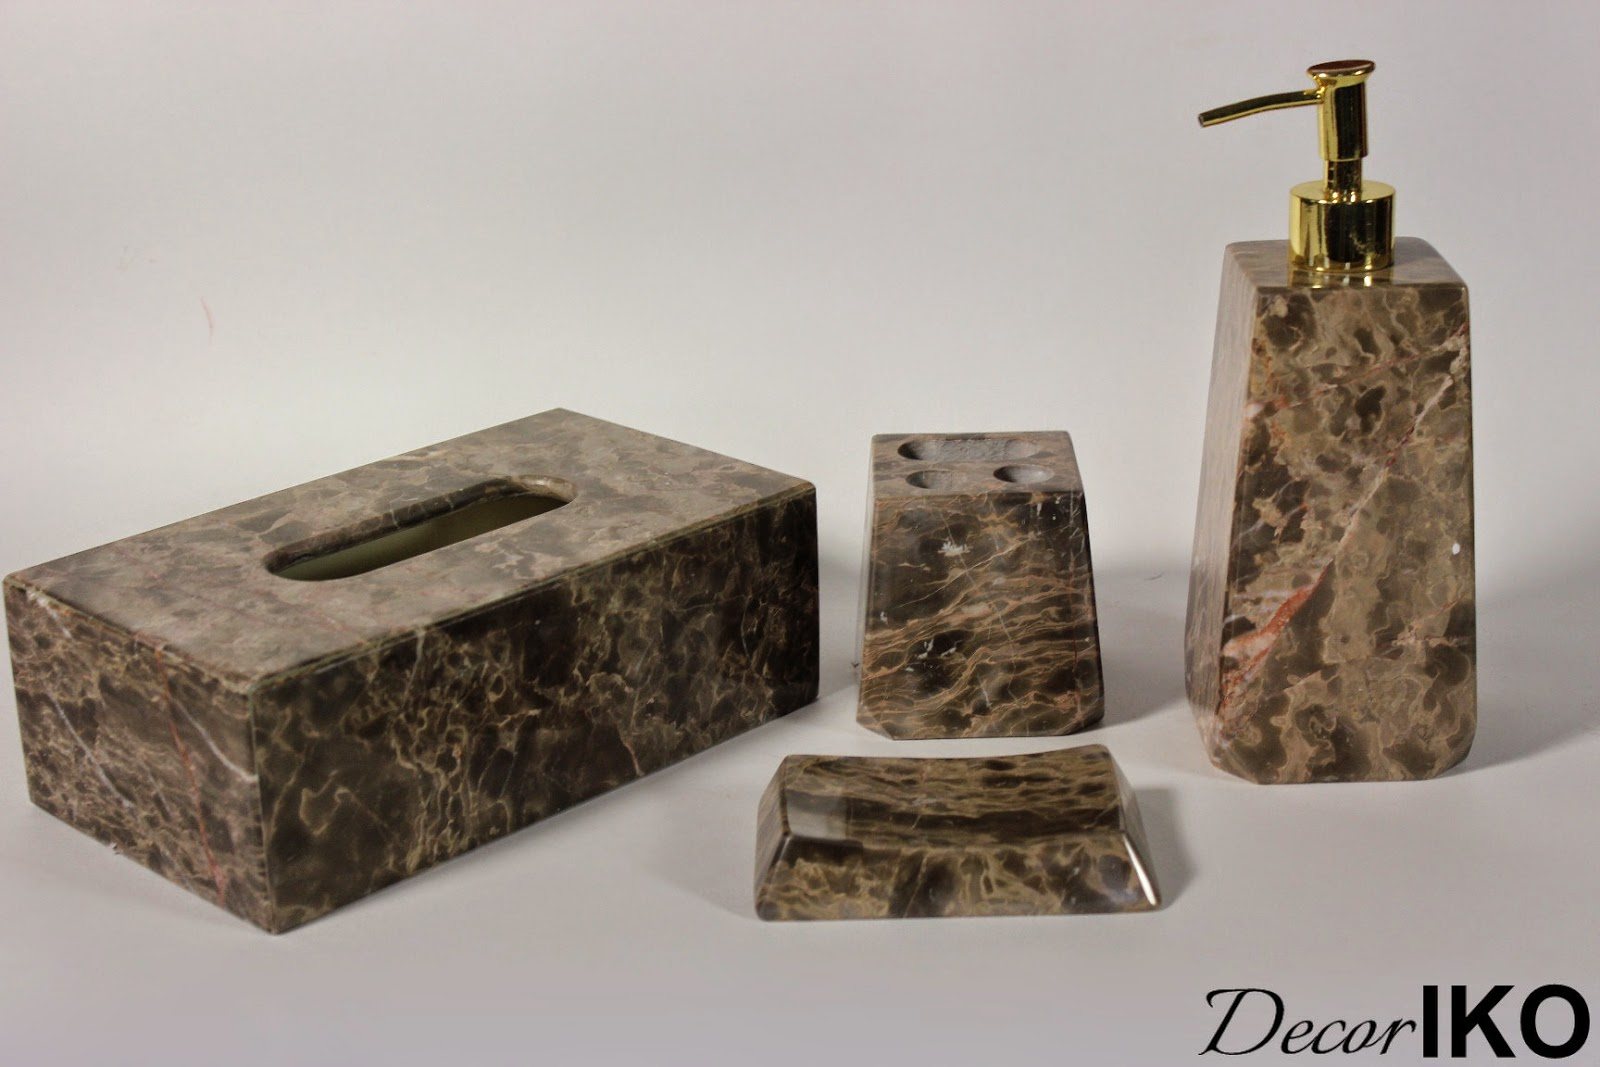 http://decoriko.ru/magazin/product/stone_access_13